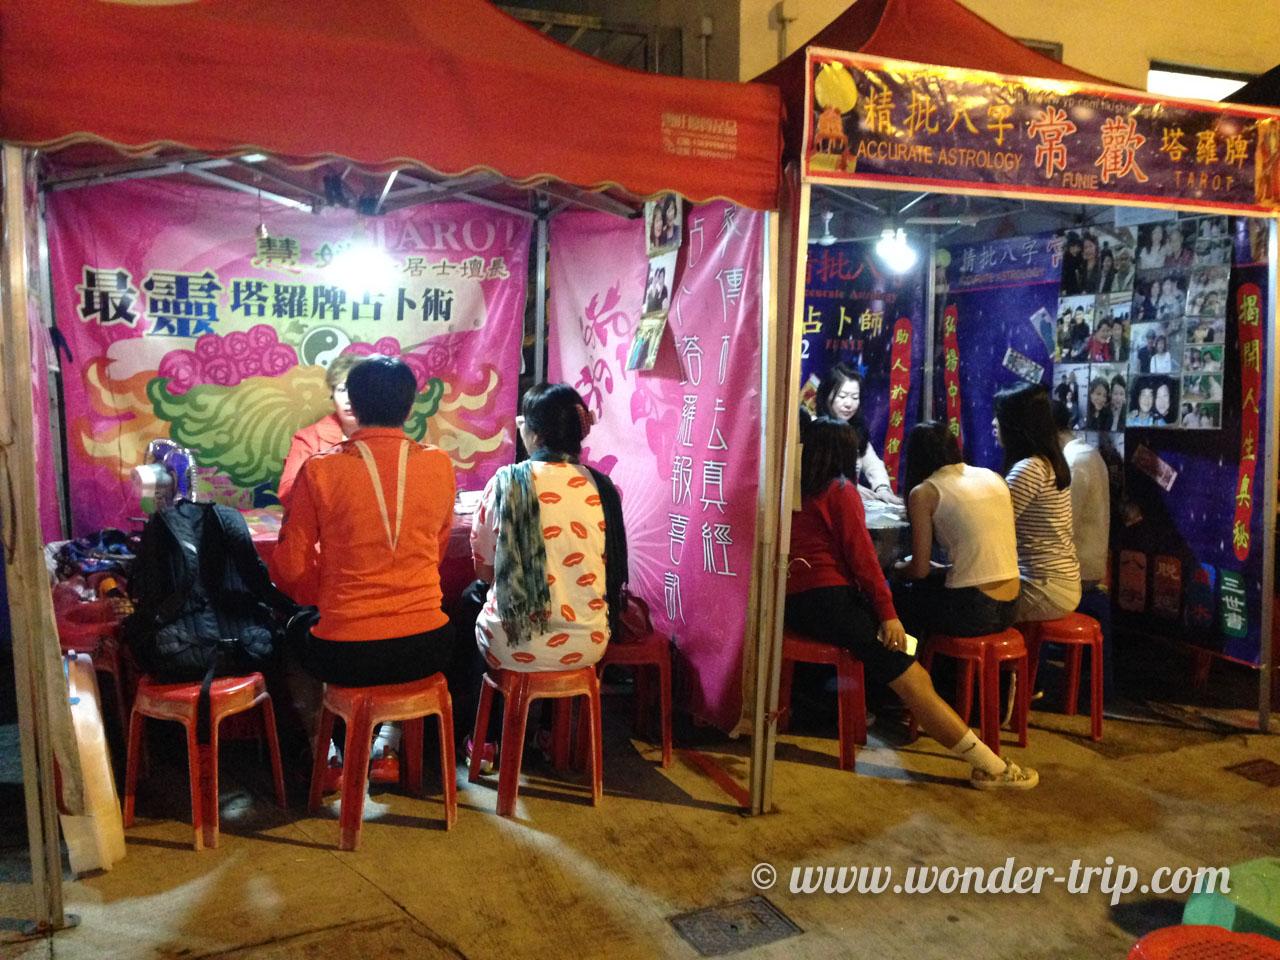 Stand de voyance du Temple night market à Hong Kong